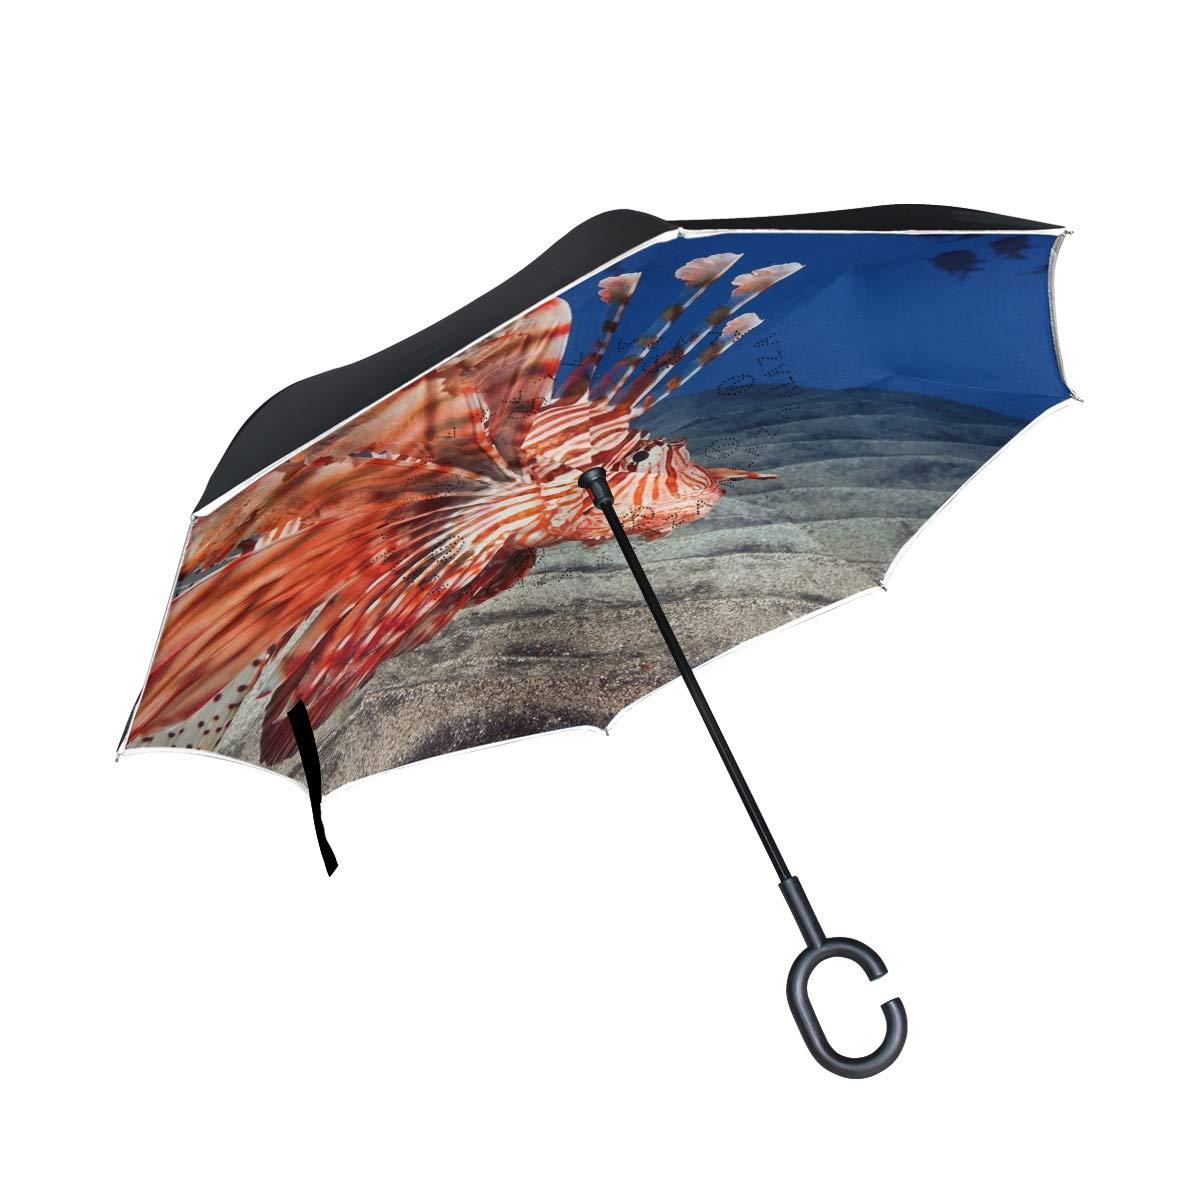 All agree 反転傘 インディアンオーシャンズ 逆傘 UV保護 防風 車 雨 日光 アウトドア ブラック One Size カラー6 B07GZ8TR7V